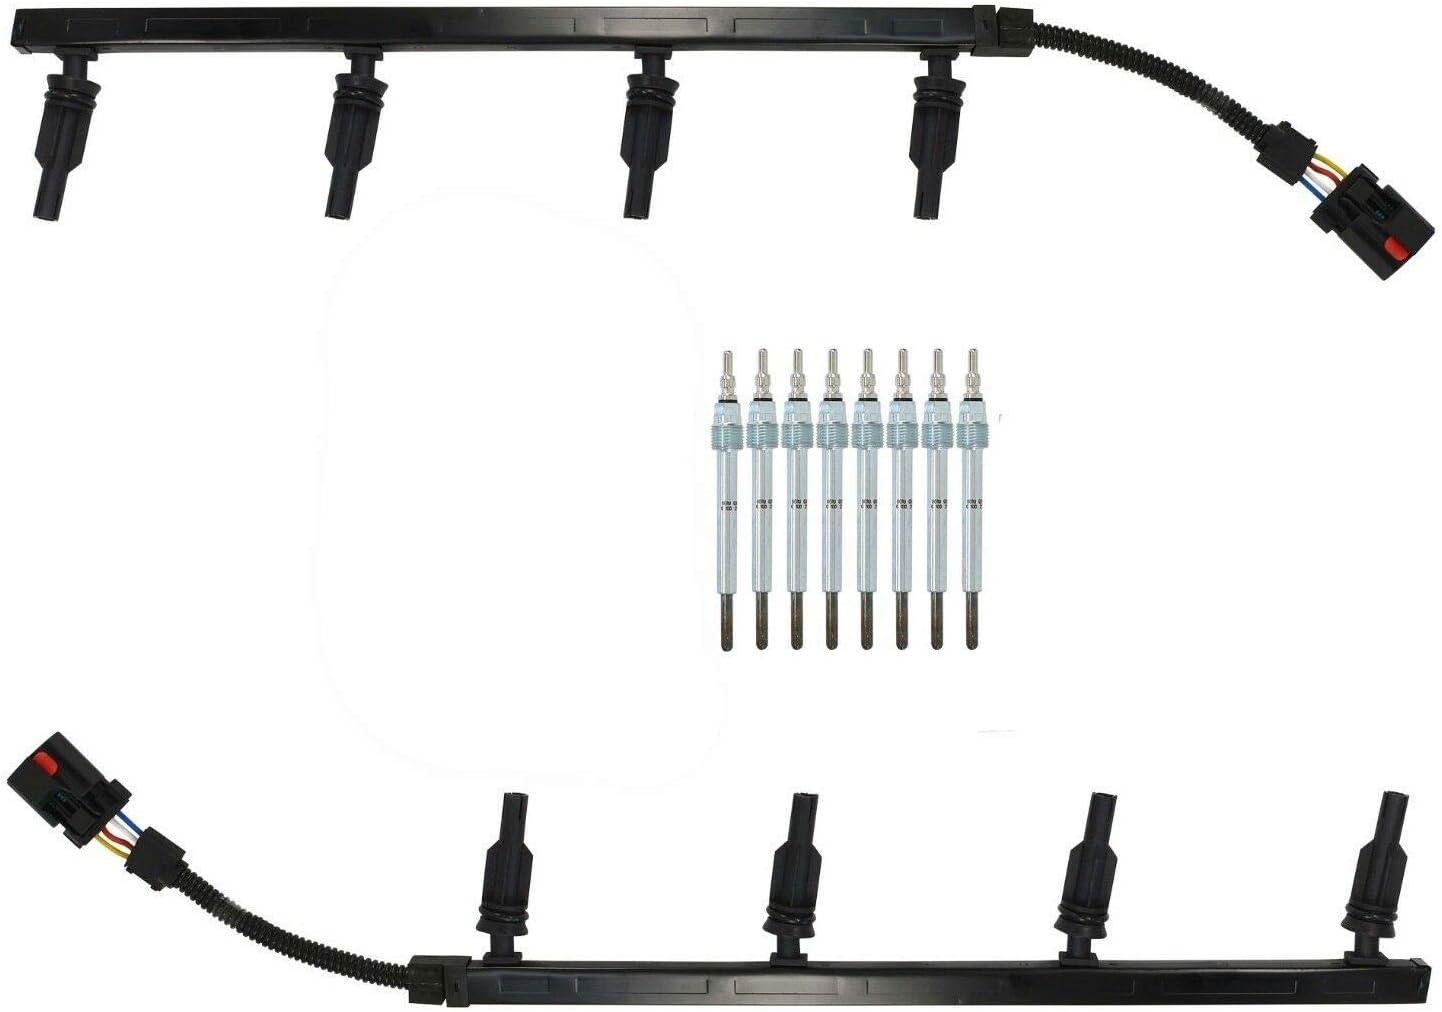 8PC GLOW PLUGS /& WIRE HARNESS SET for 2003 F250 F350 F450 F550 6.0L POWERSTROKE